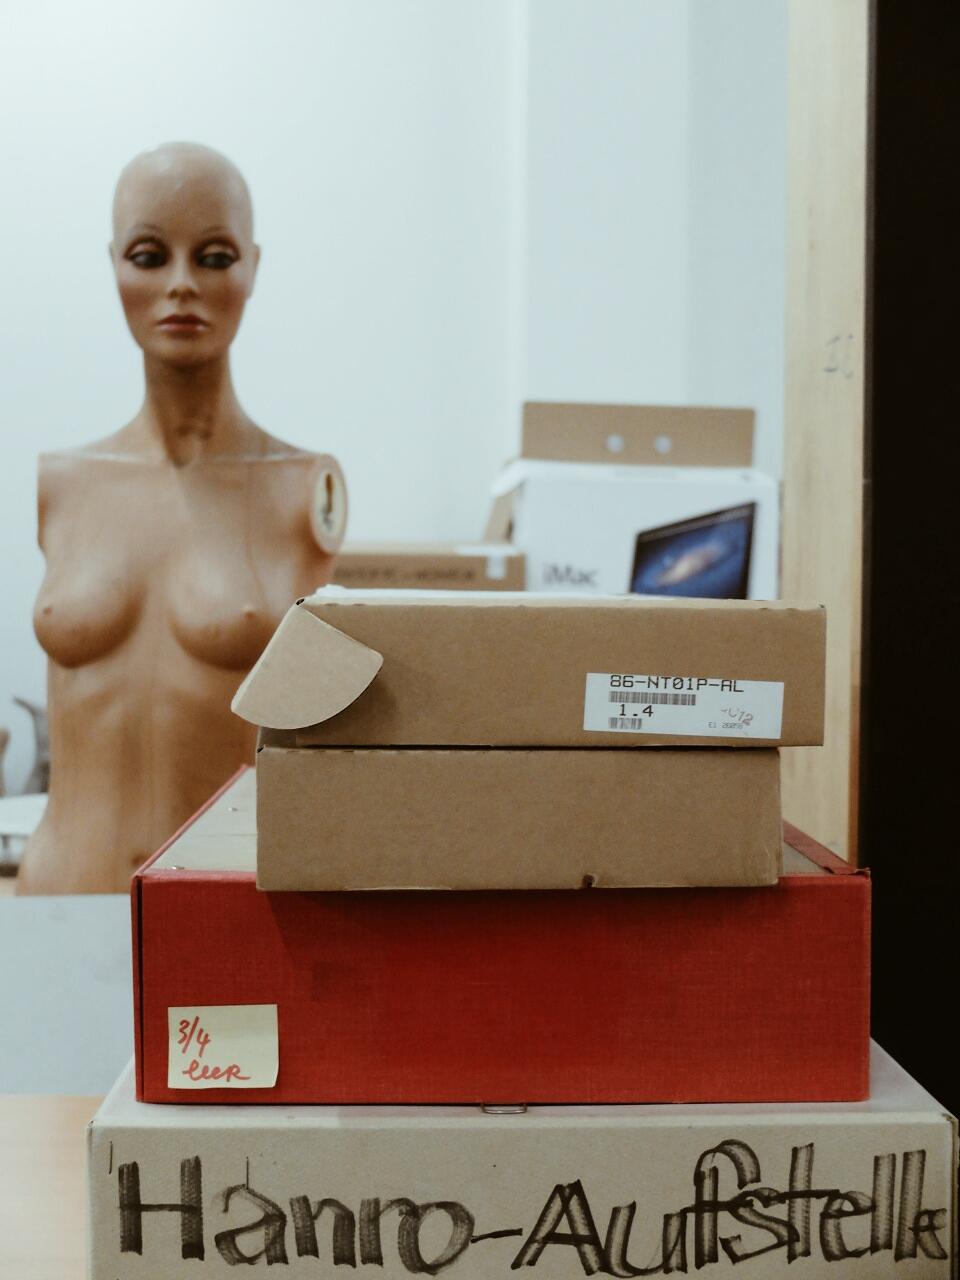 23-Hanro-archive-liestal-museum-Baselland.jpg